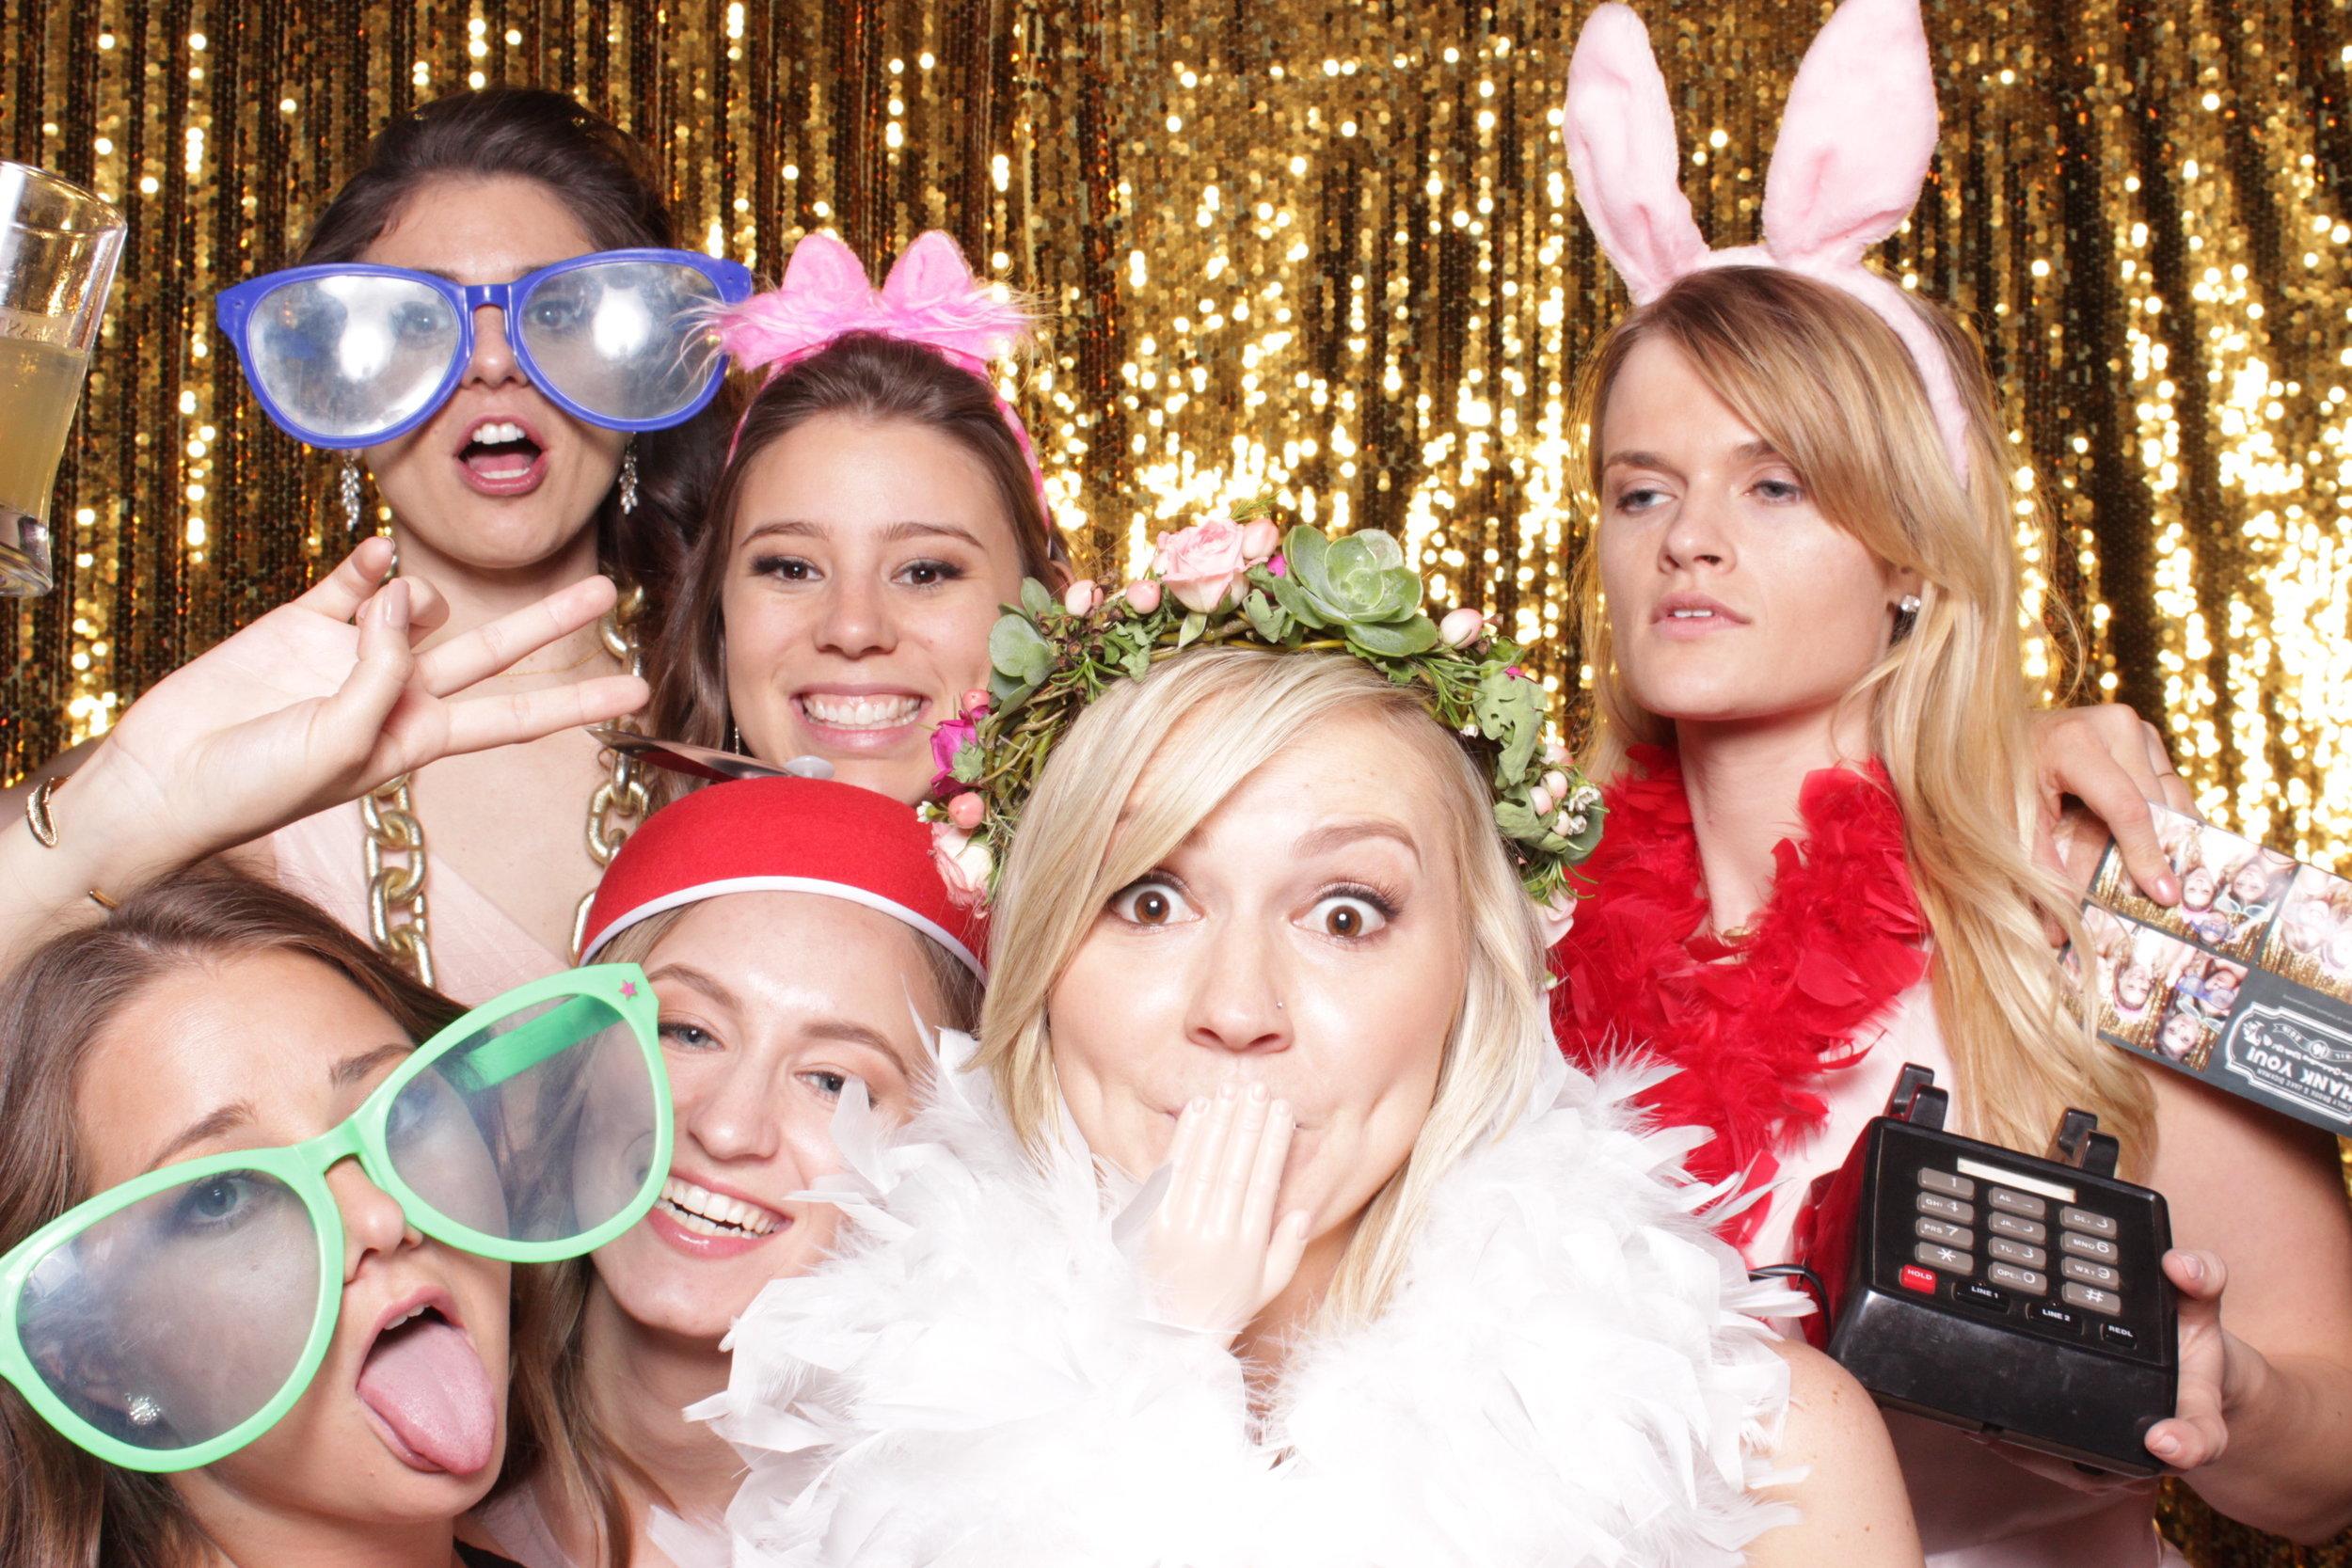 chico-wedding-photo-booth-rental-pretty-girls